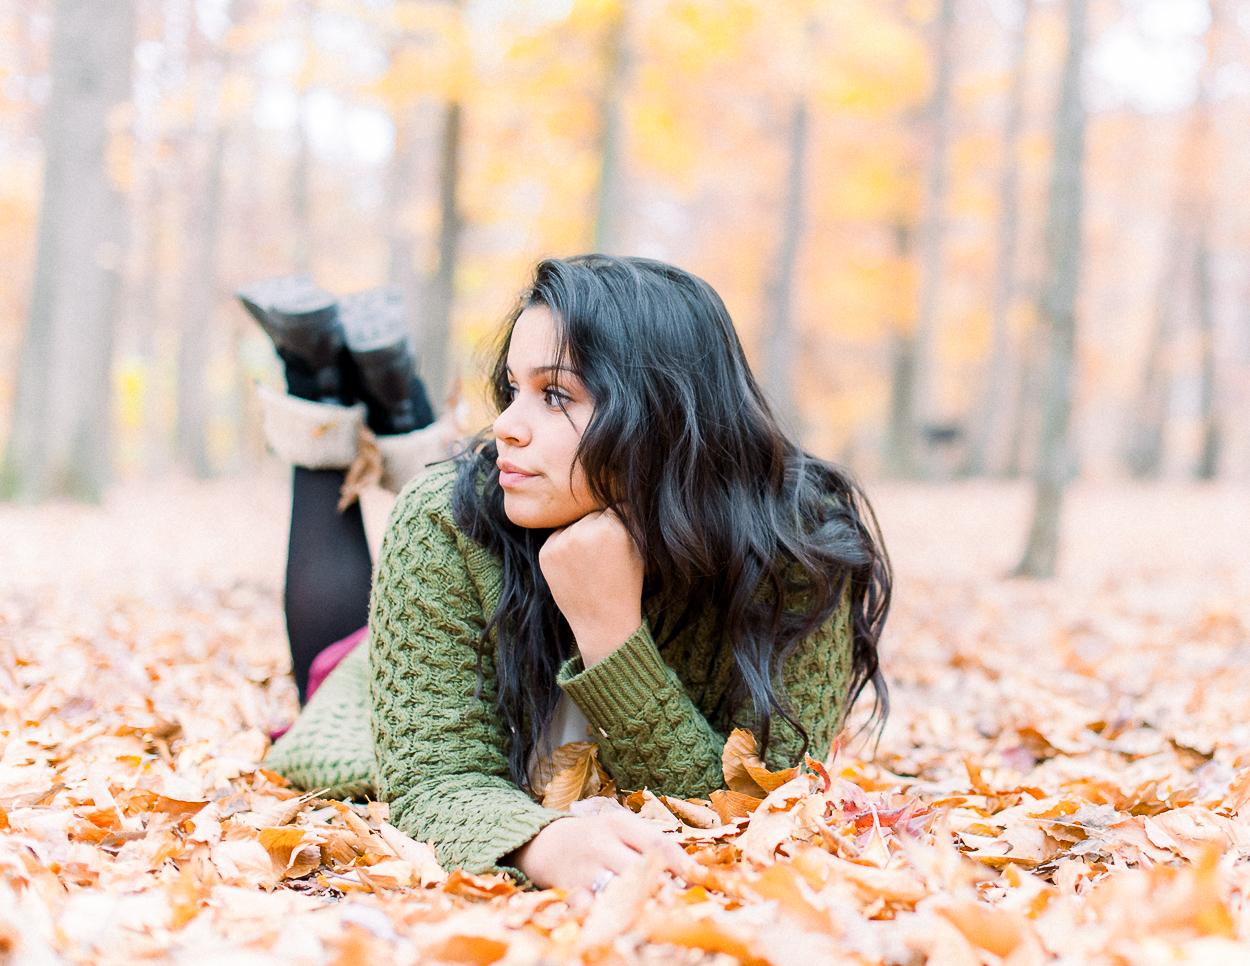 seniorphotos_fall_fredericksburgphotographer_virginia_youseephotography_ashley (14).JPG